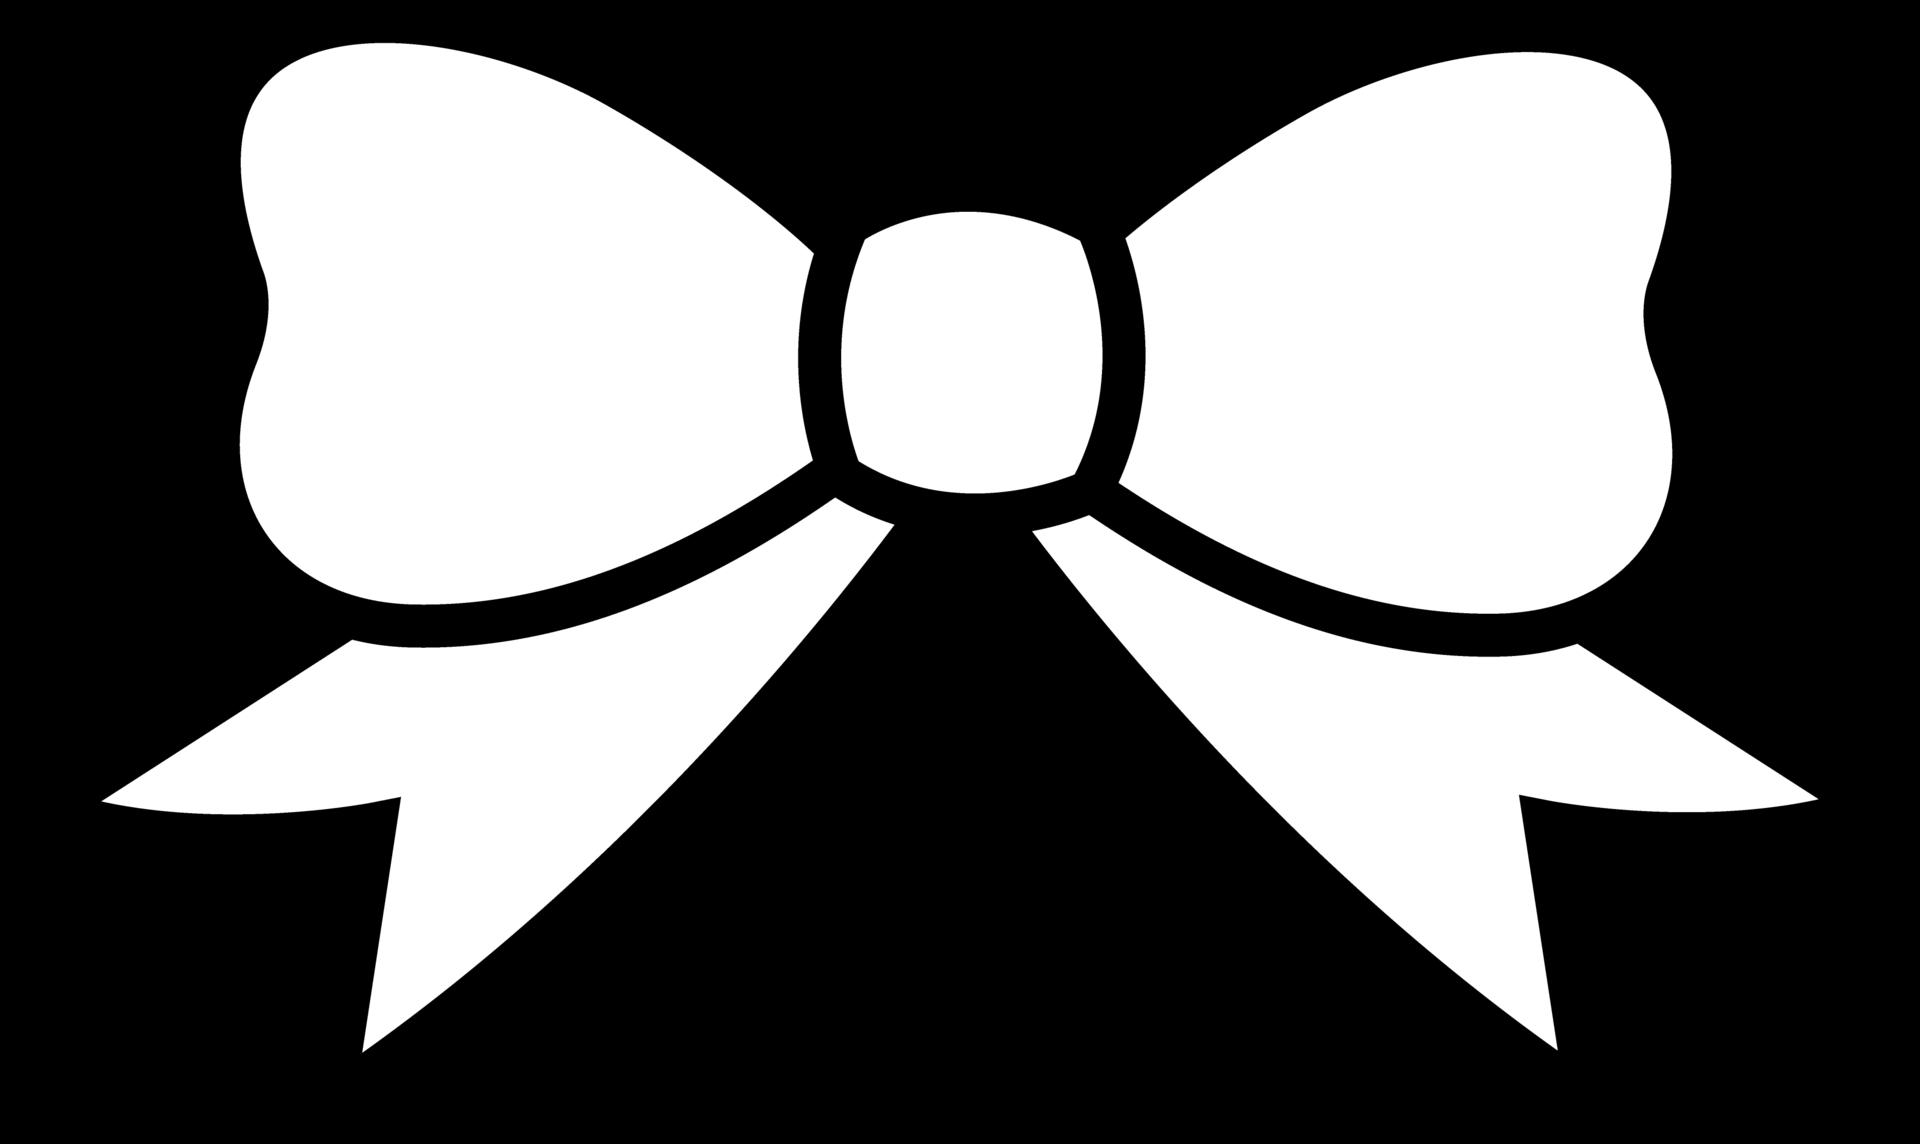 Free Black Tie Silhouette, Download Free Clip Art, Free Clip.